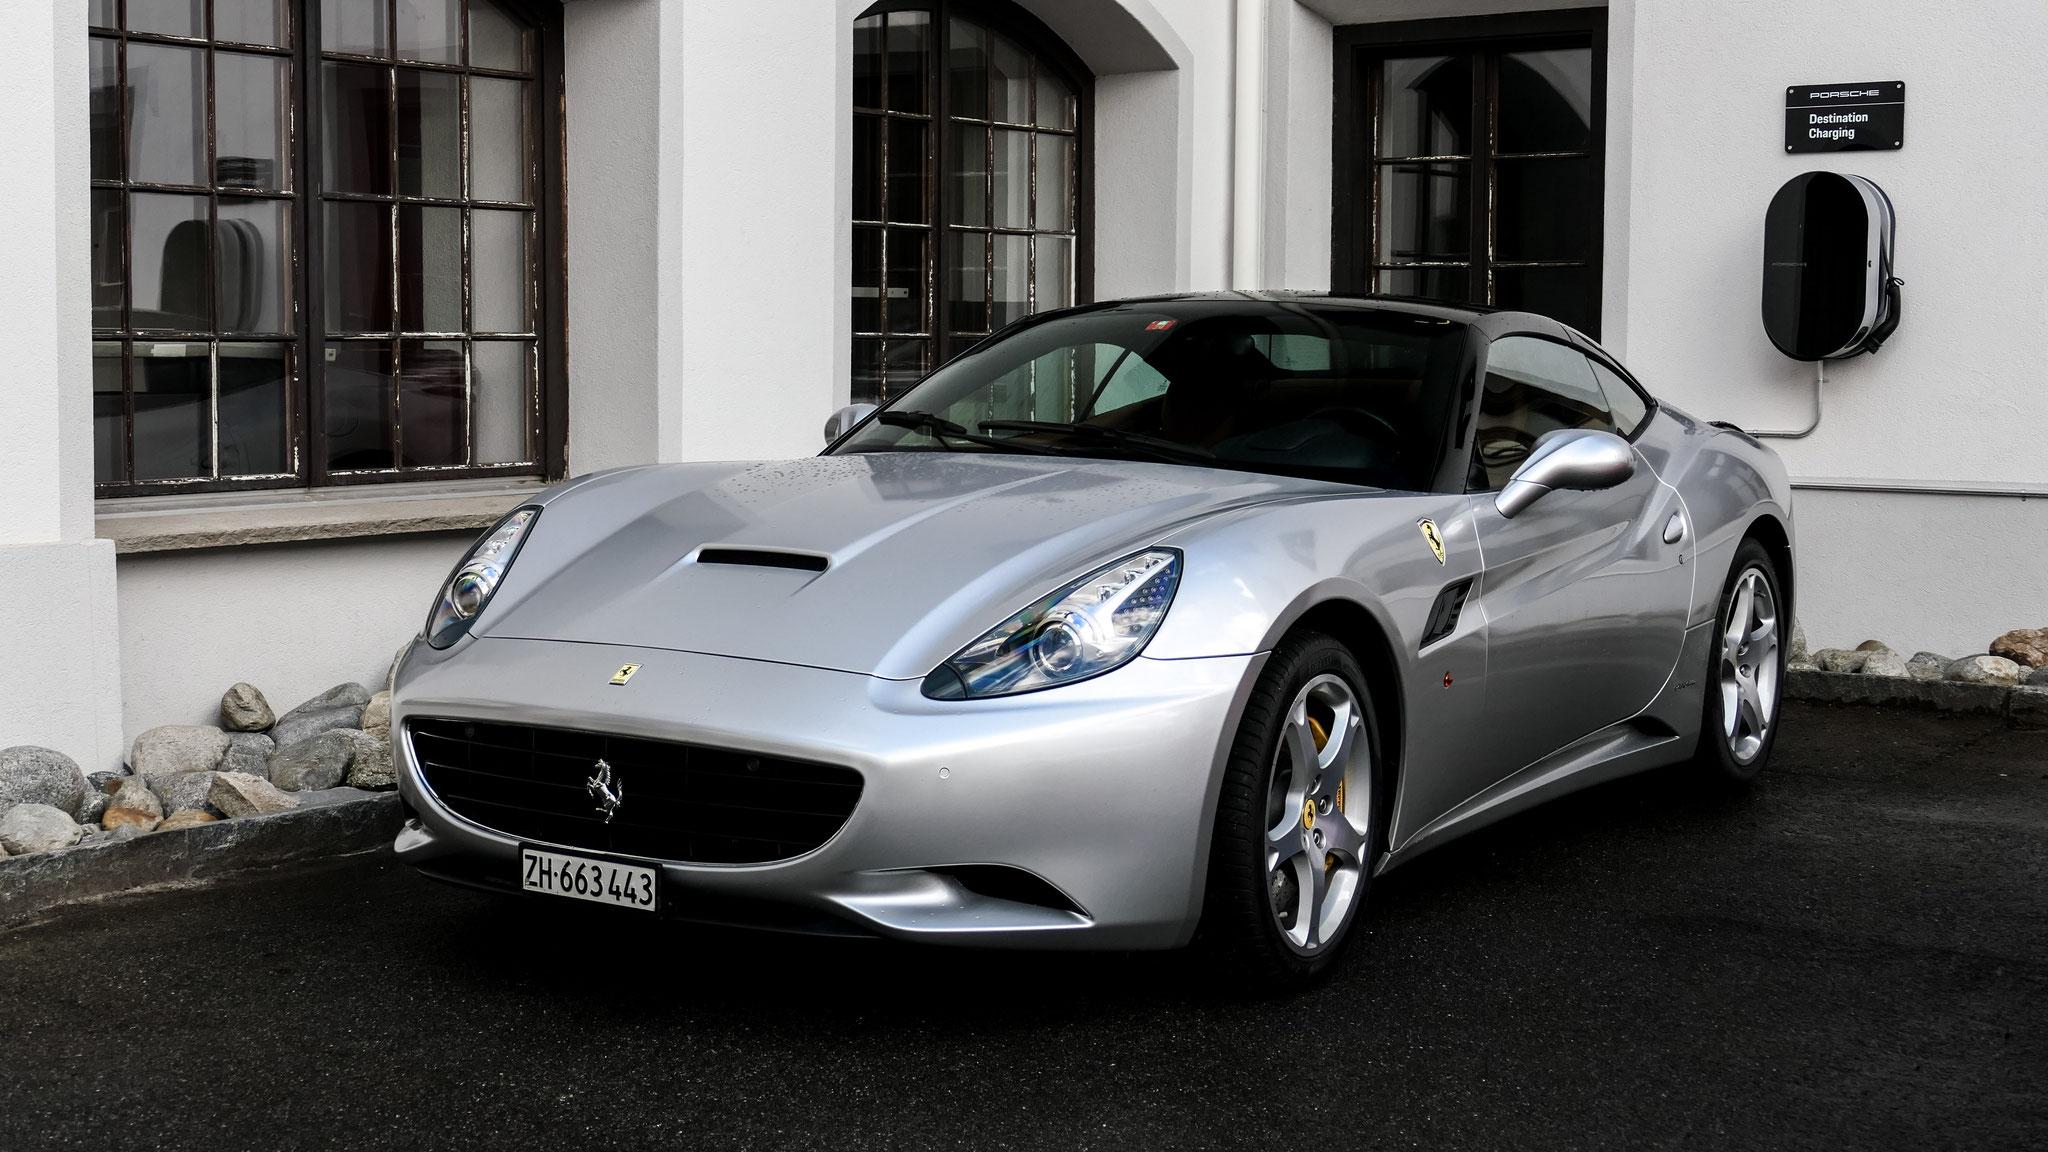 Ferrari California - ZH-663443 (CH)